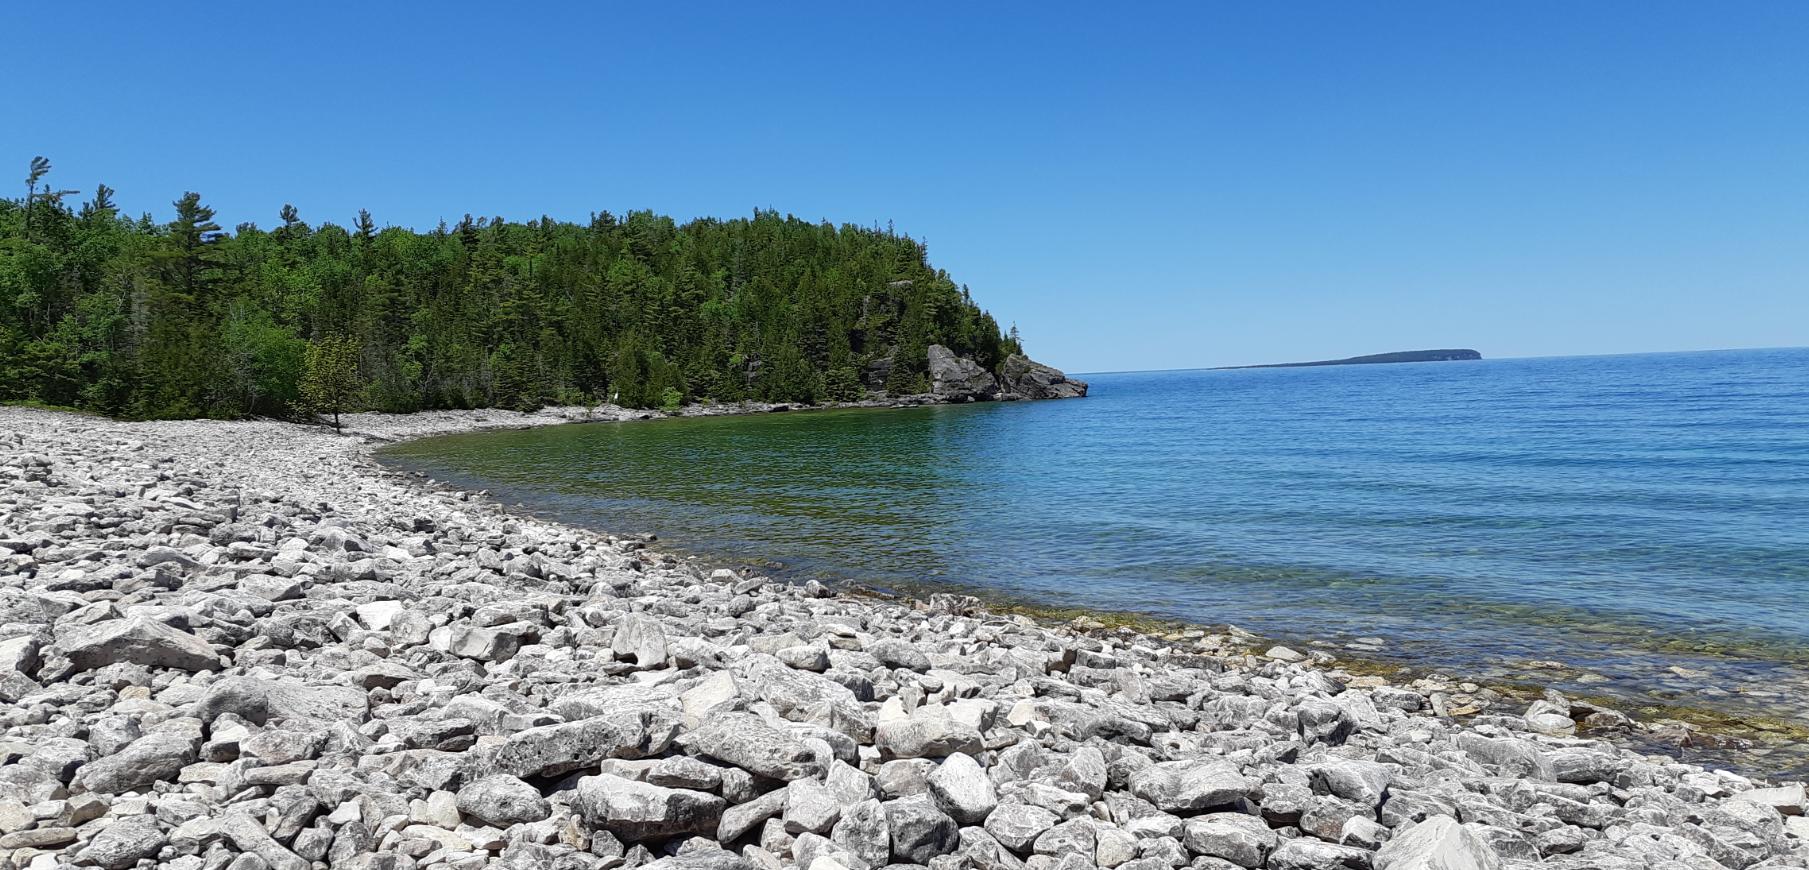 Bruce peninsula trail, rocky shore